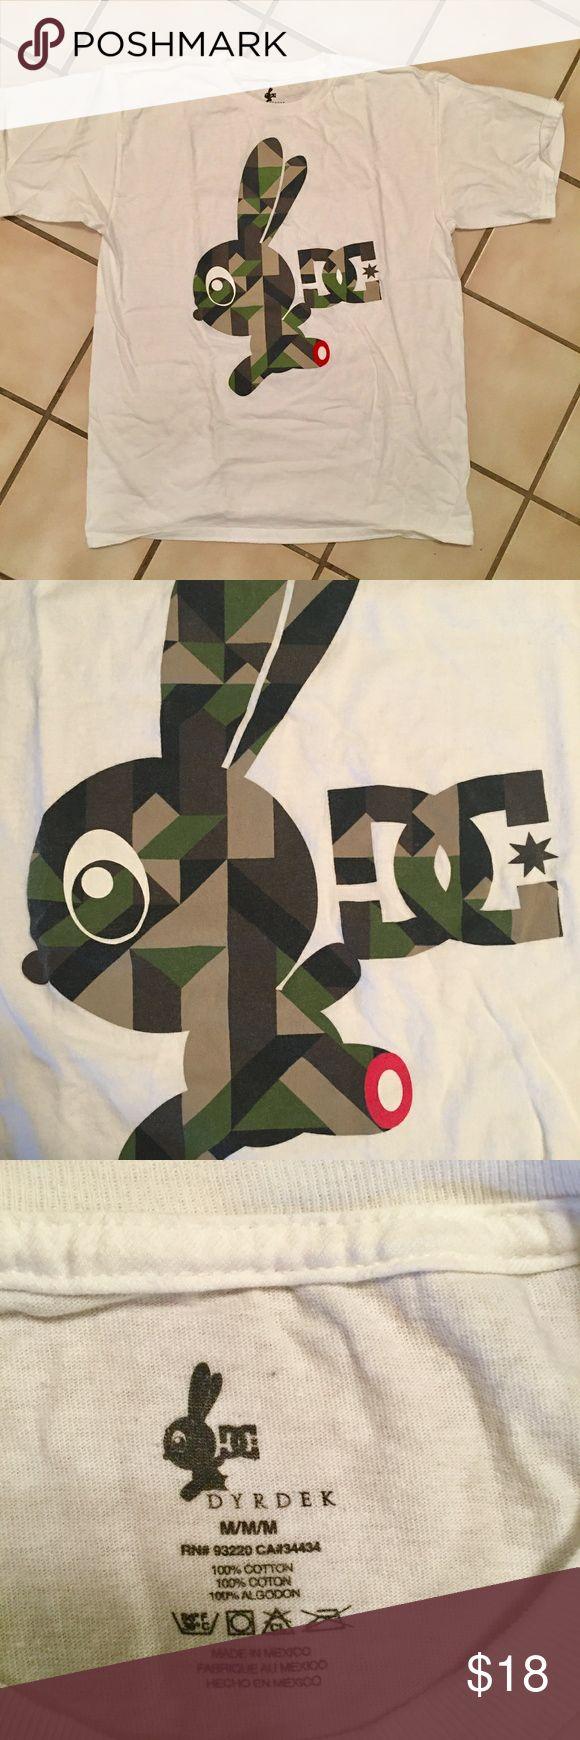 DC ROB DYRDEK MENS SKATE SHIRT!!! DC Rob Dyrdek men's skate t-shirt size M. White with camo bunny. Great condition- no stains, pulls or rips. DC Shirts